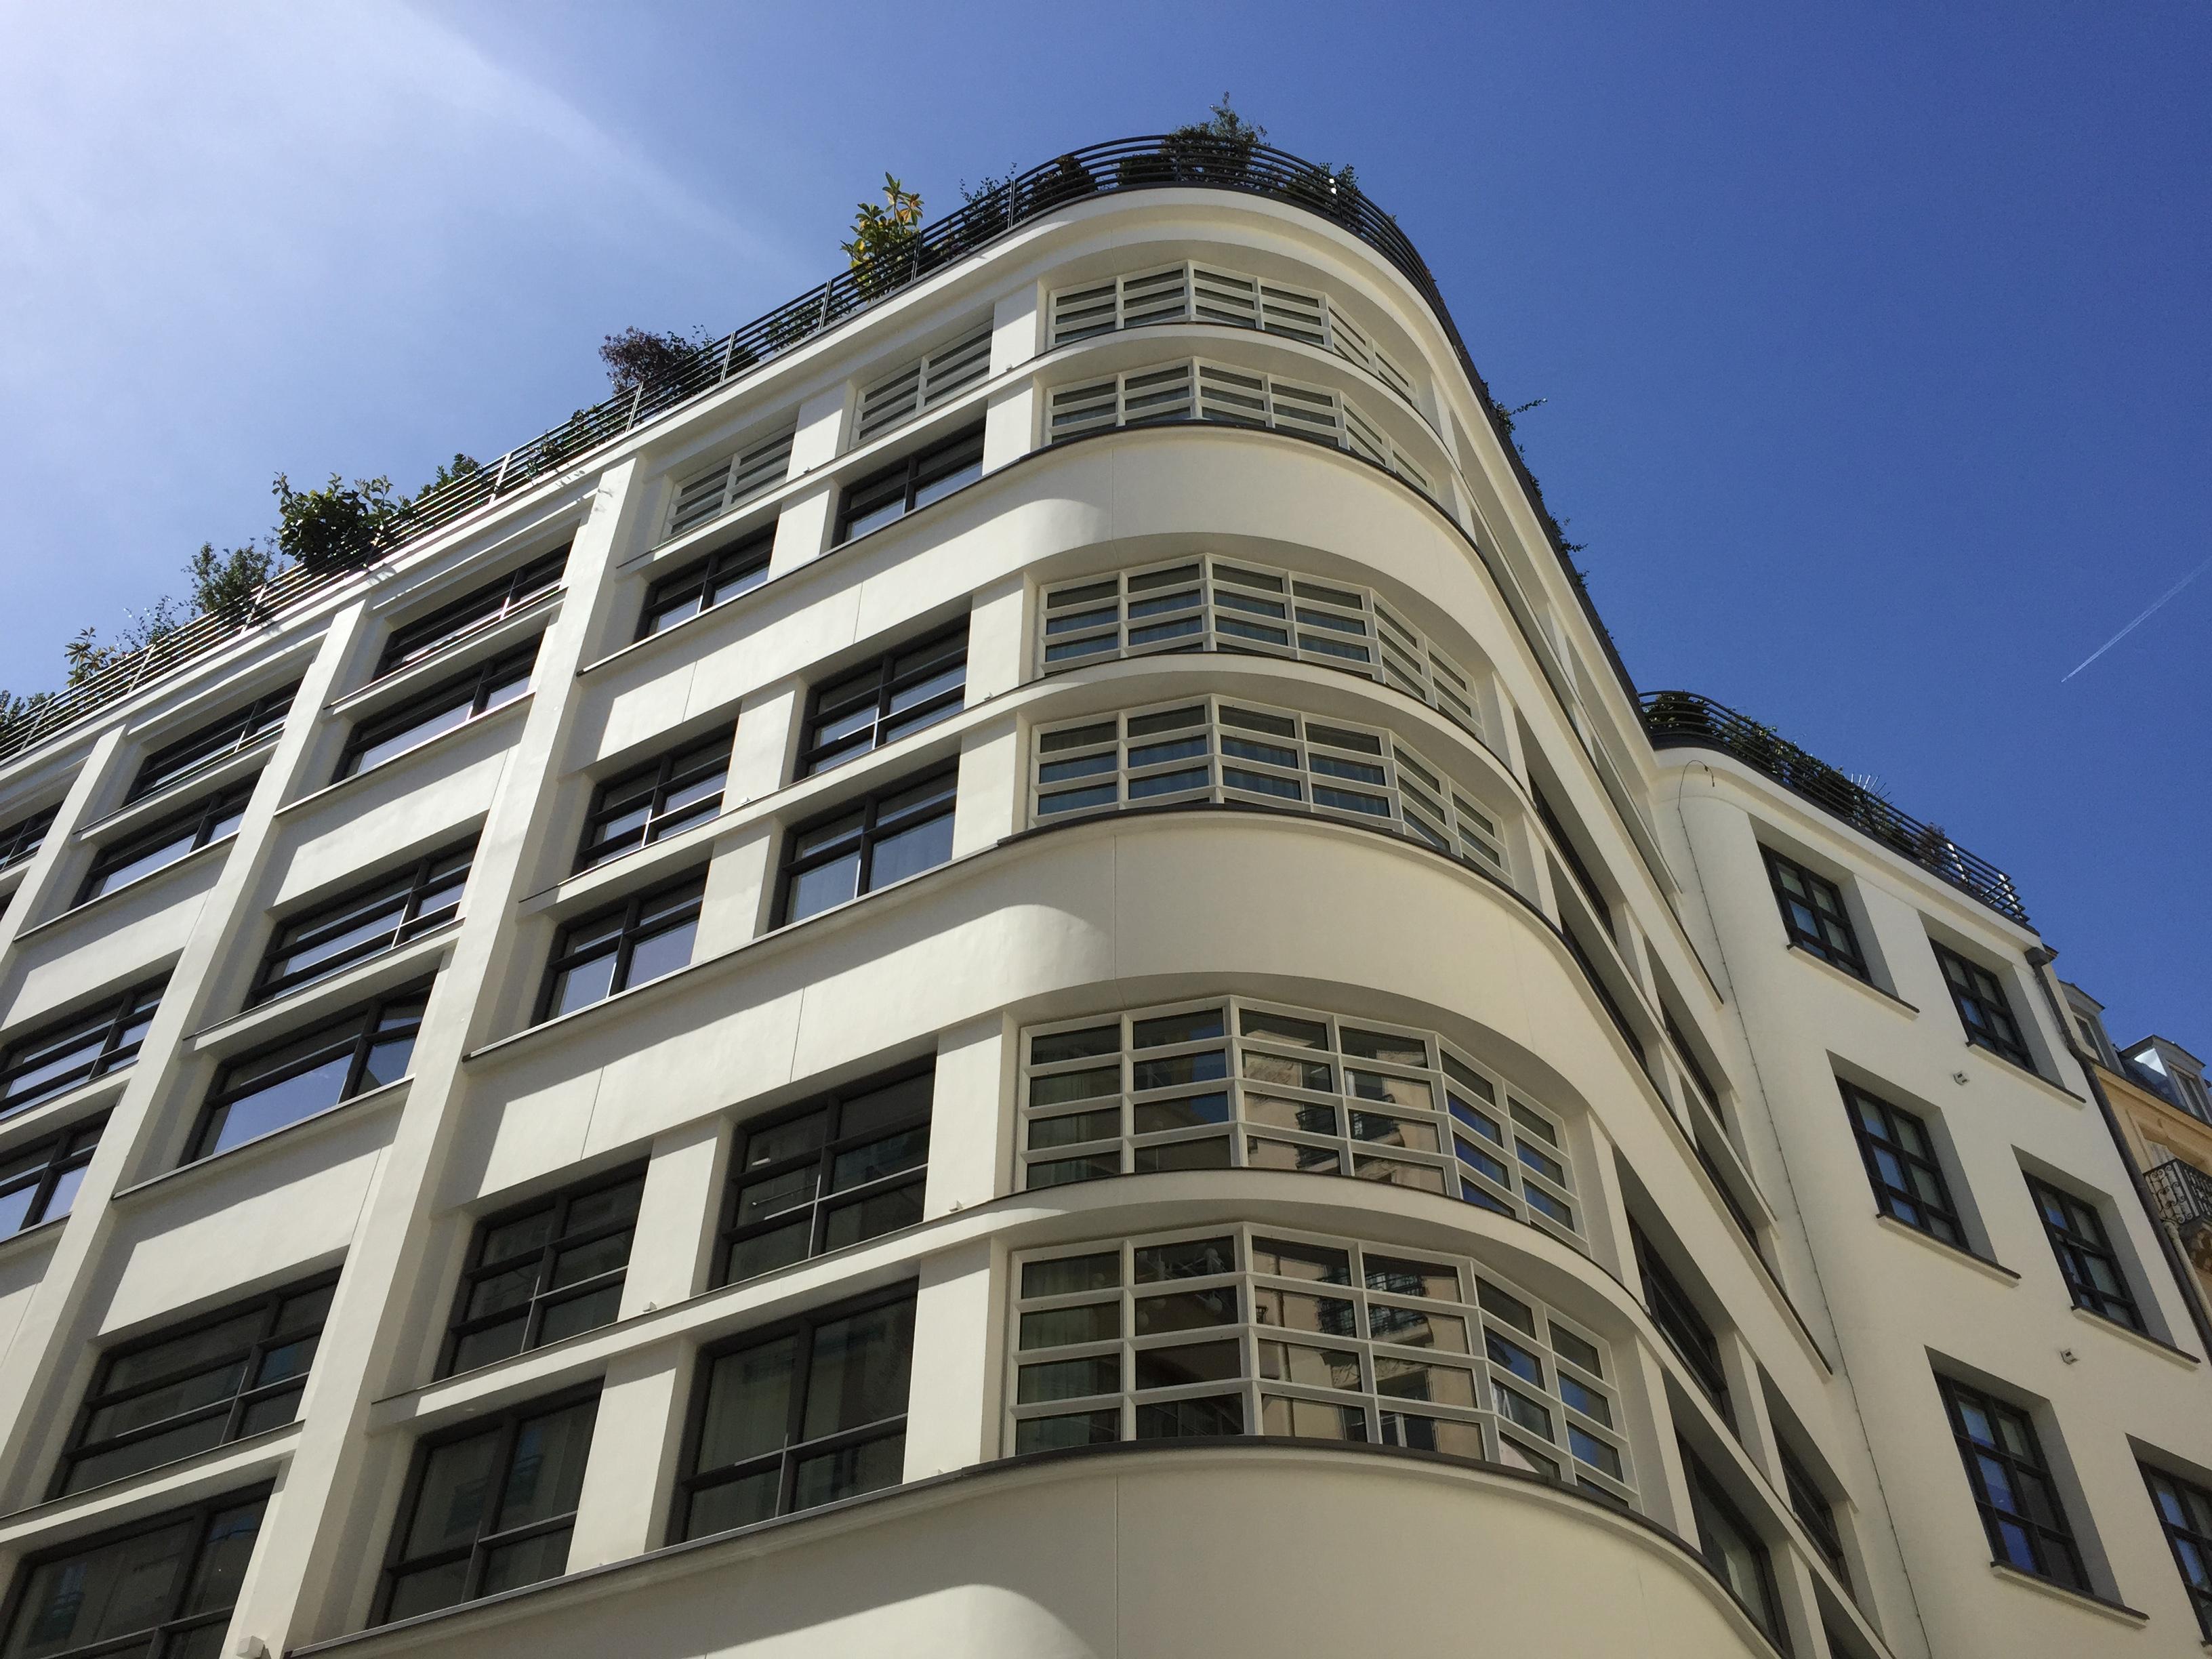 le cinq codet hotel in paris fancyoli. Black Bedroom Furniture Sets. Home Design Ideas